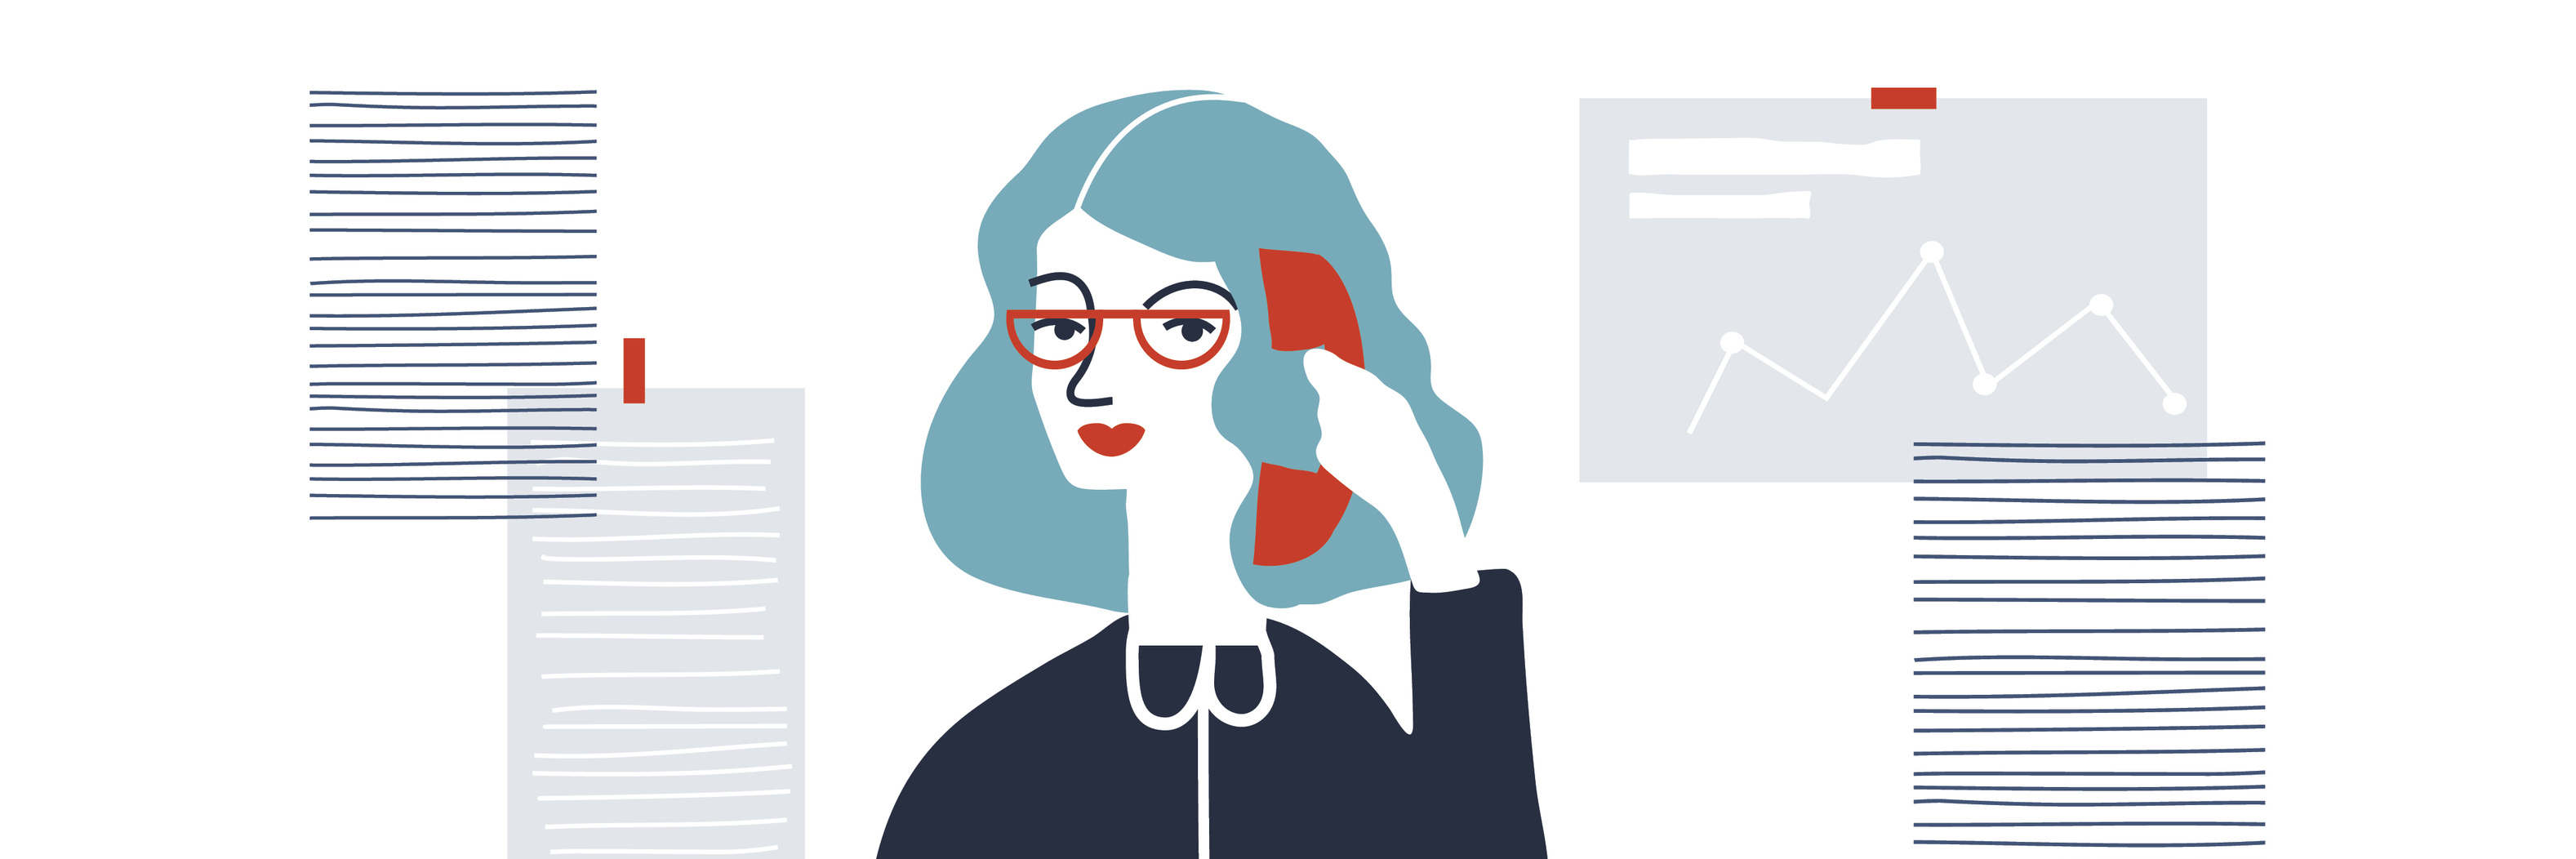 Woman financial accountant. Secretary vector illustration. Young businesswoman. Creative modern vector illustration.